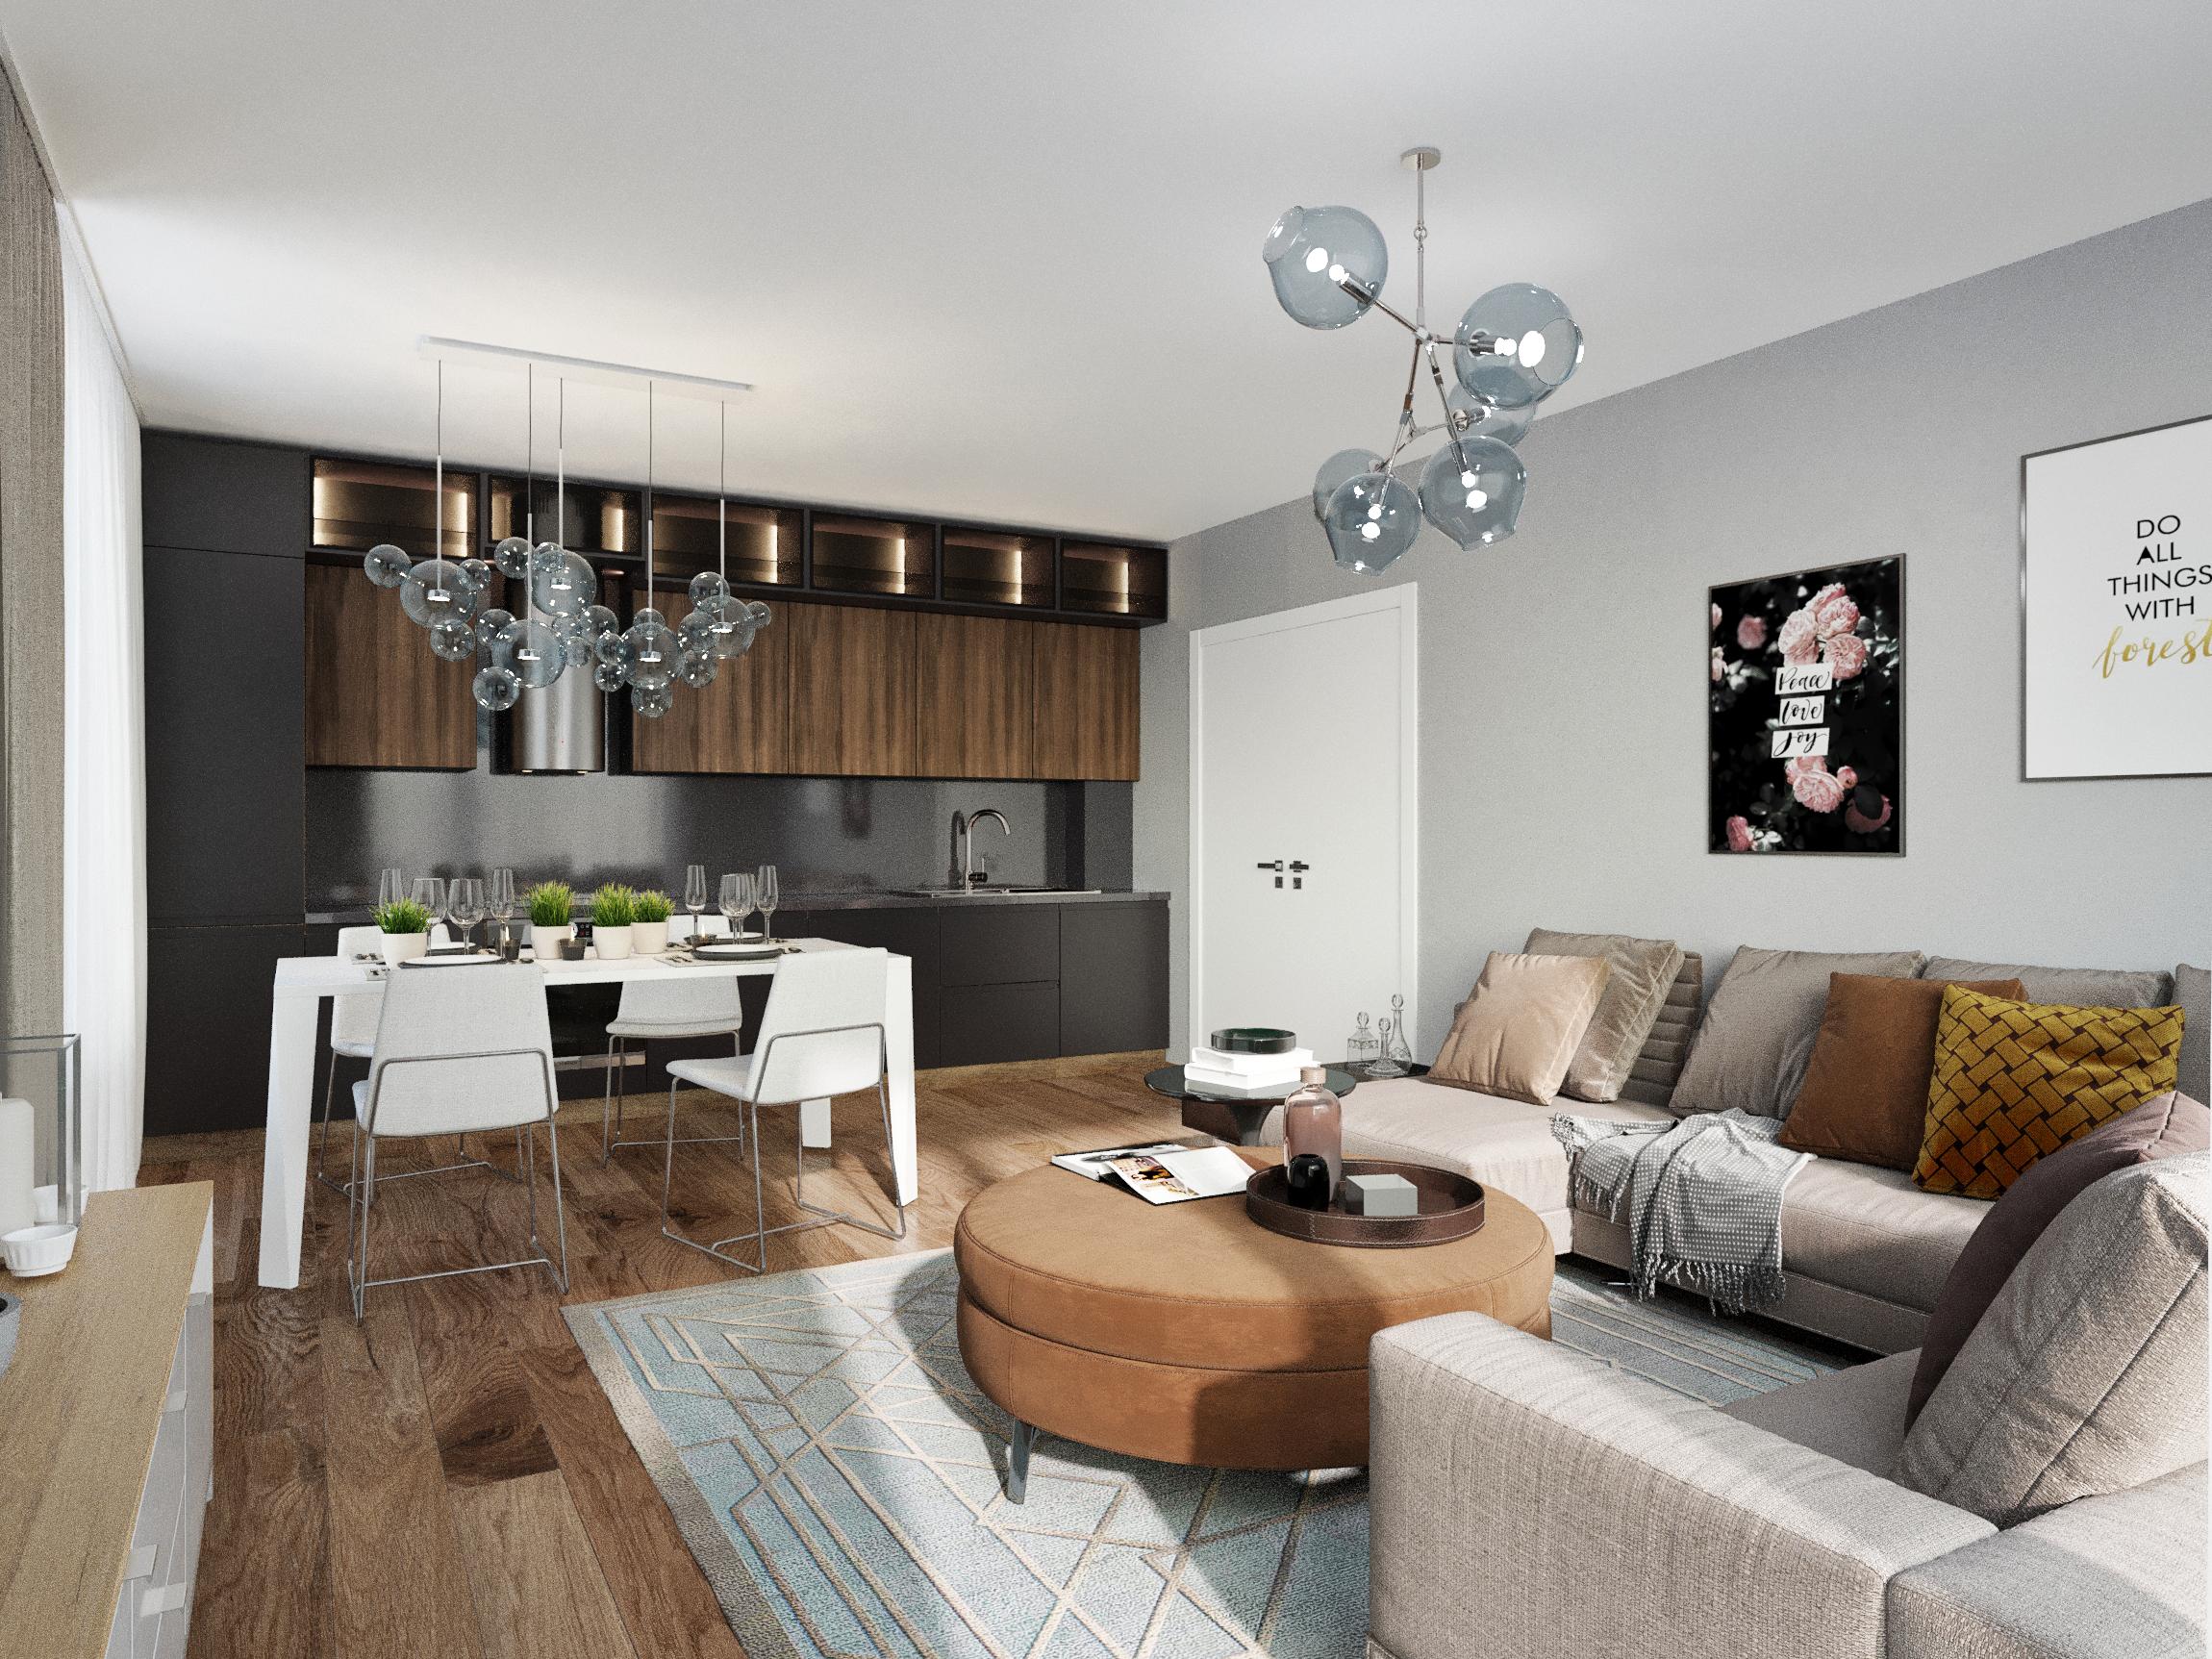 LivingRoom - Apartament 3 camere - Boreal Plus Constanța